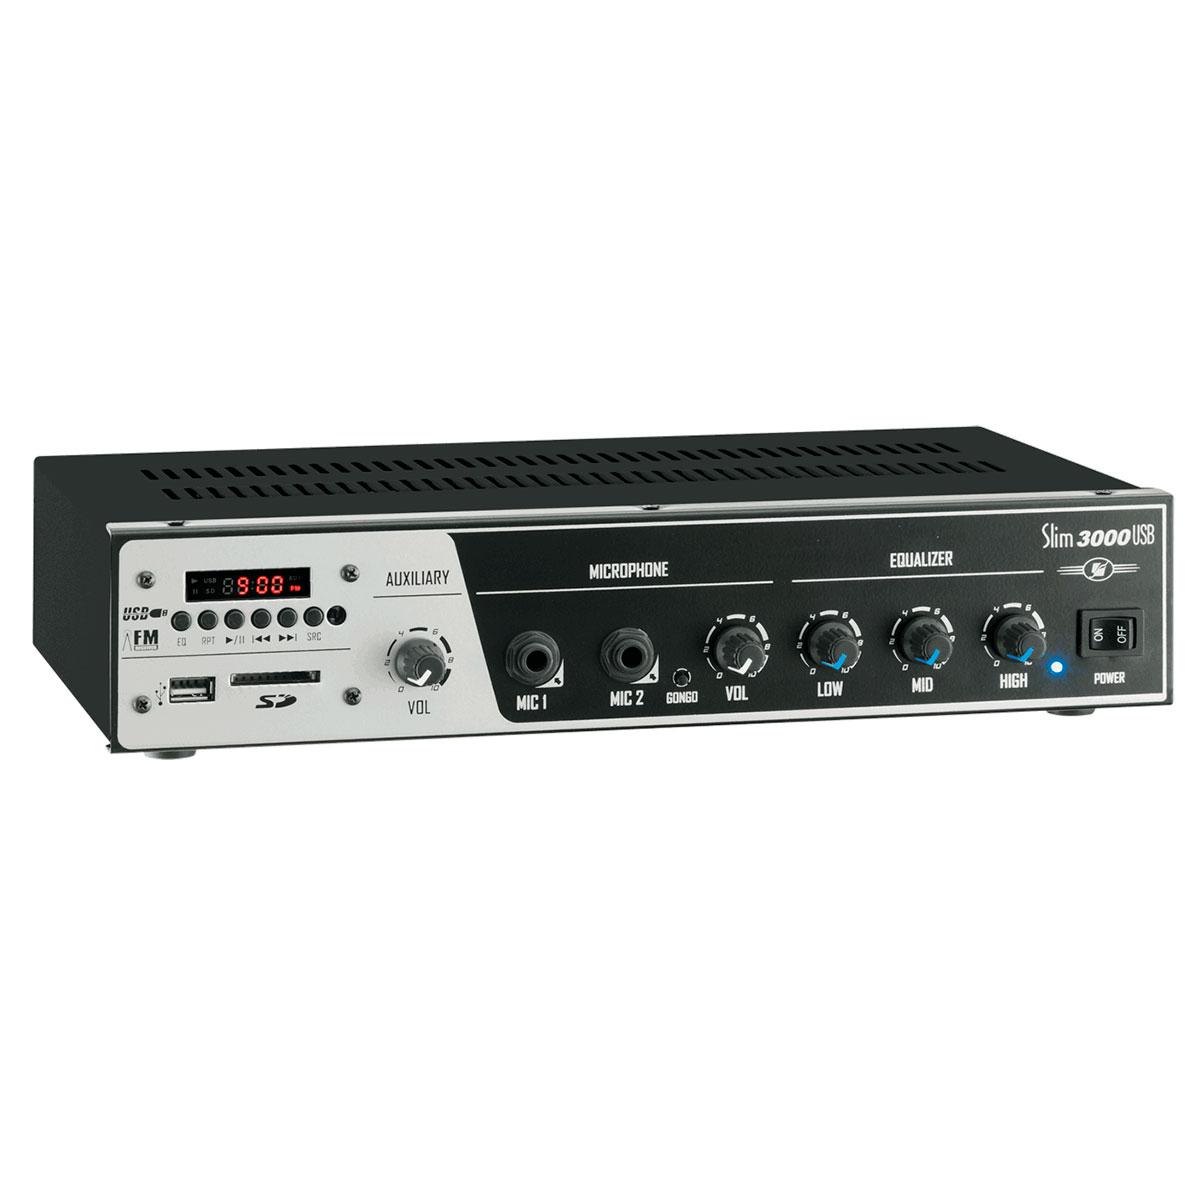 Slim3000USB - Amplificador Mono 200W Slim 3000 USB - Frahm